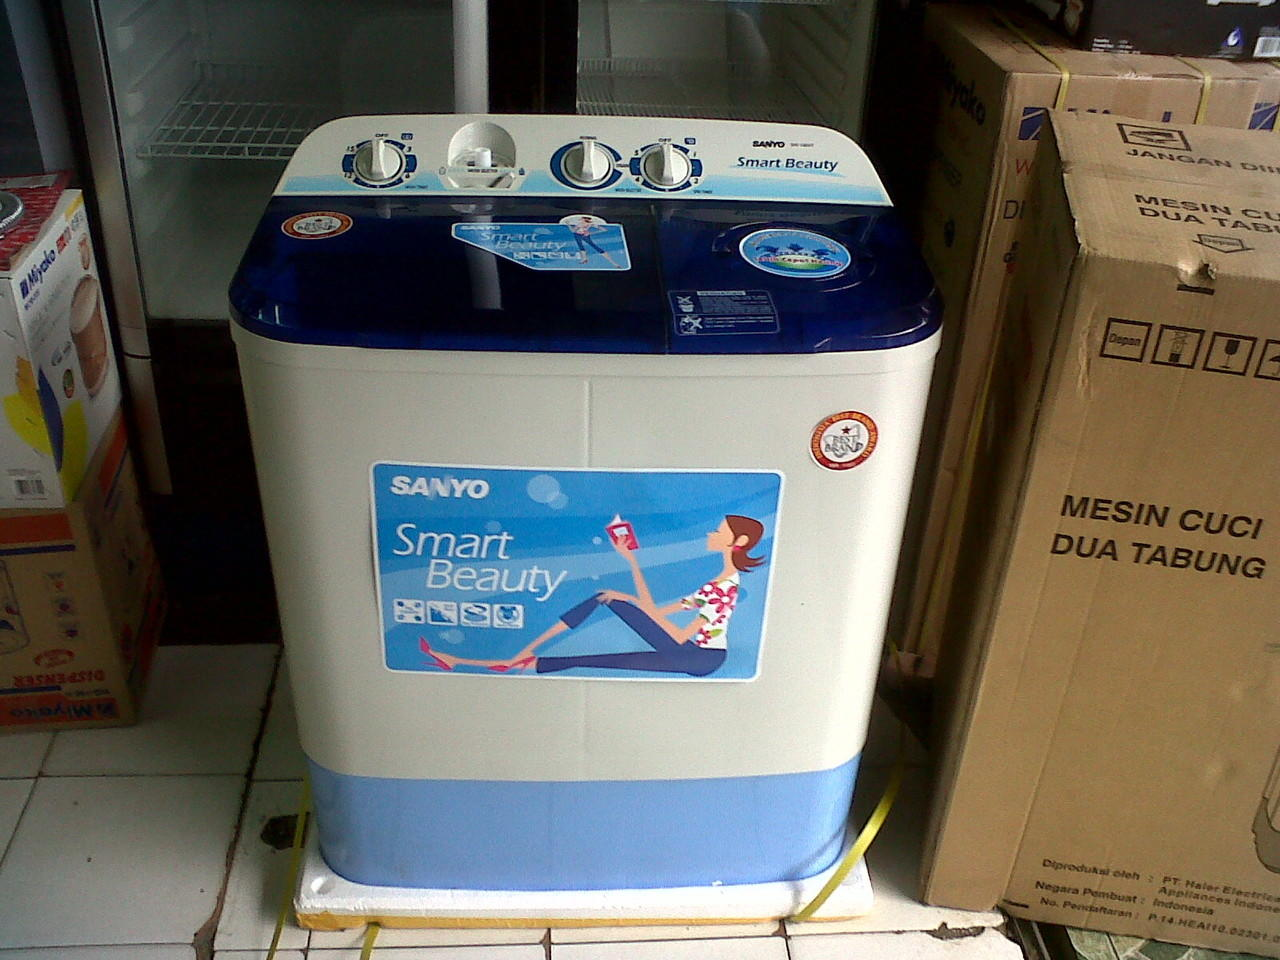 Sanyo Washing Machine Sw 740 Xt Smart Beauty 7 Kg Daftar Harga Mesin Cuci Sw755xt Anti Tikus